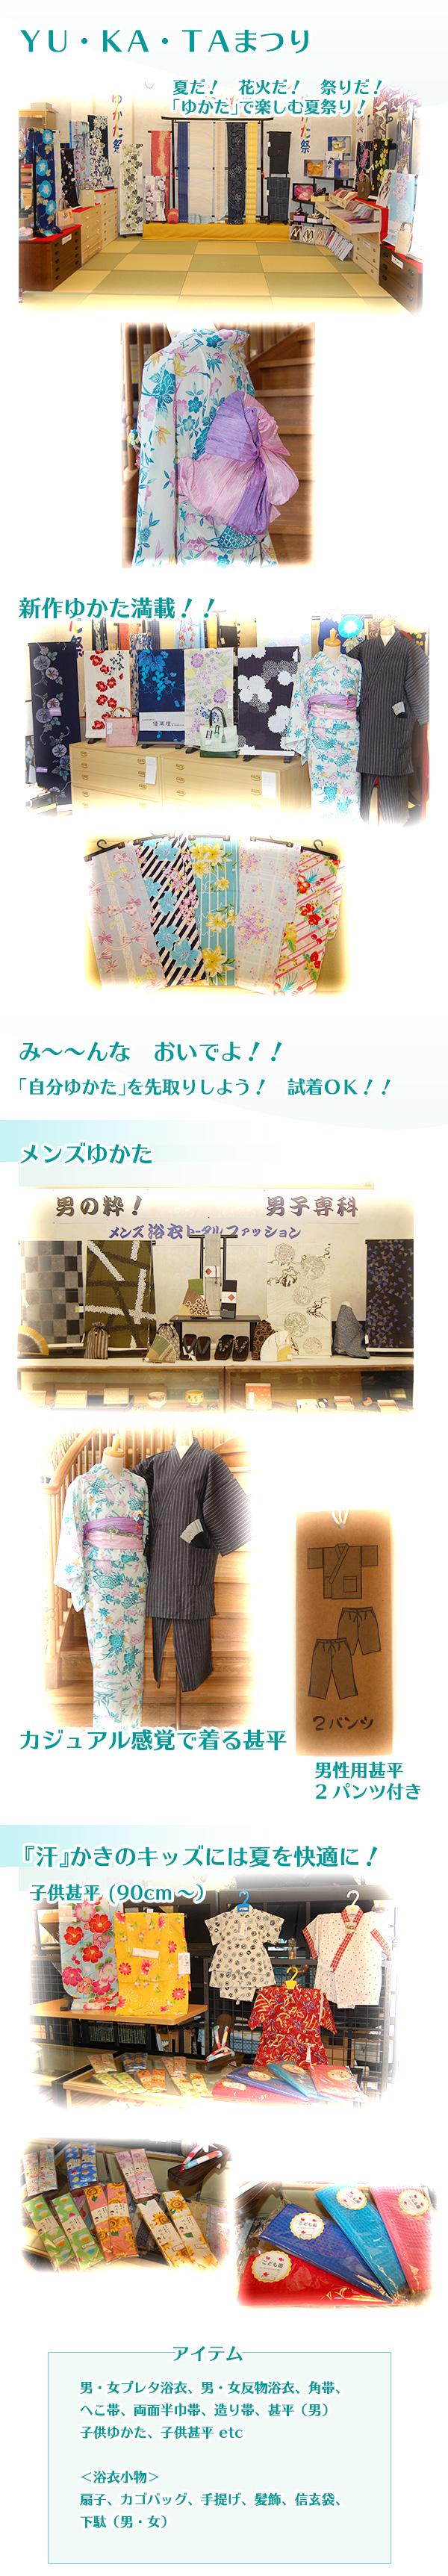 180609_yuka_fig01.jpg